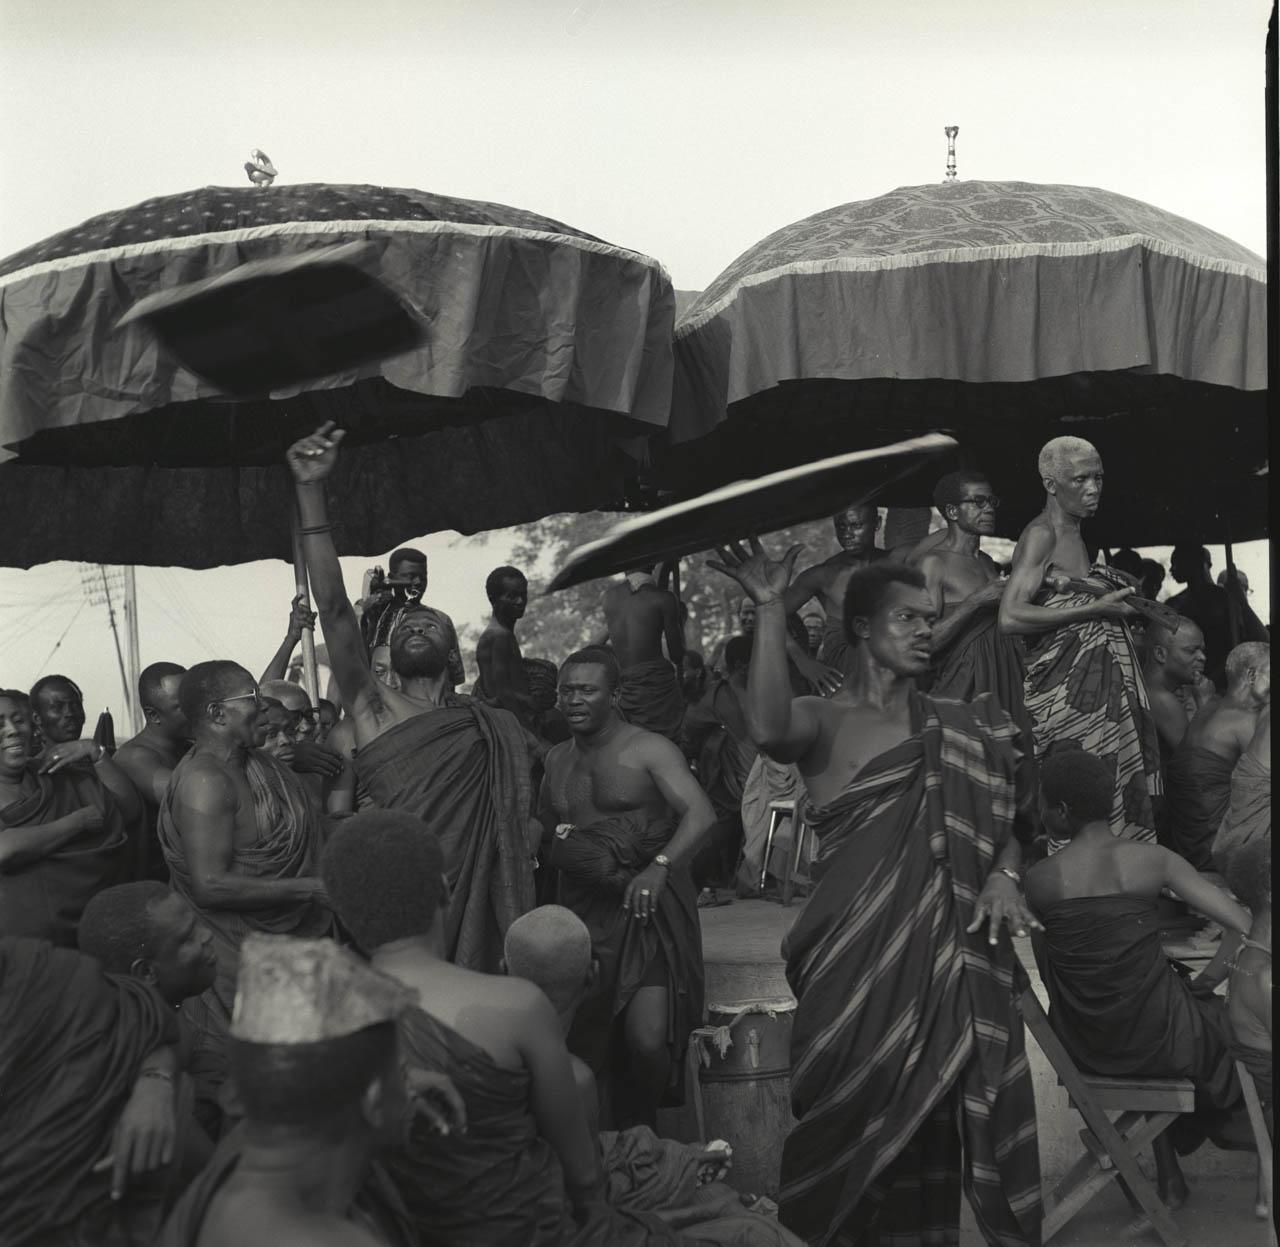 group w 2 lg umbrellas.jpg